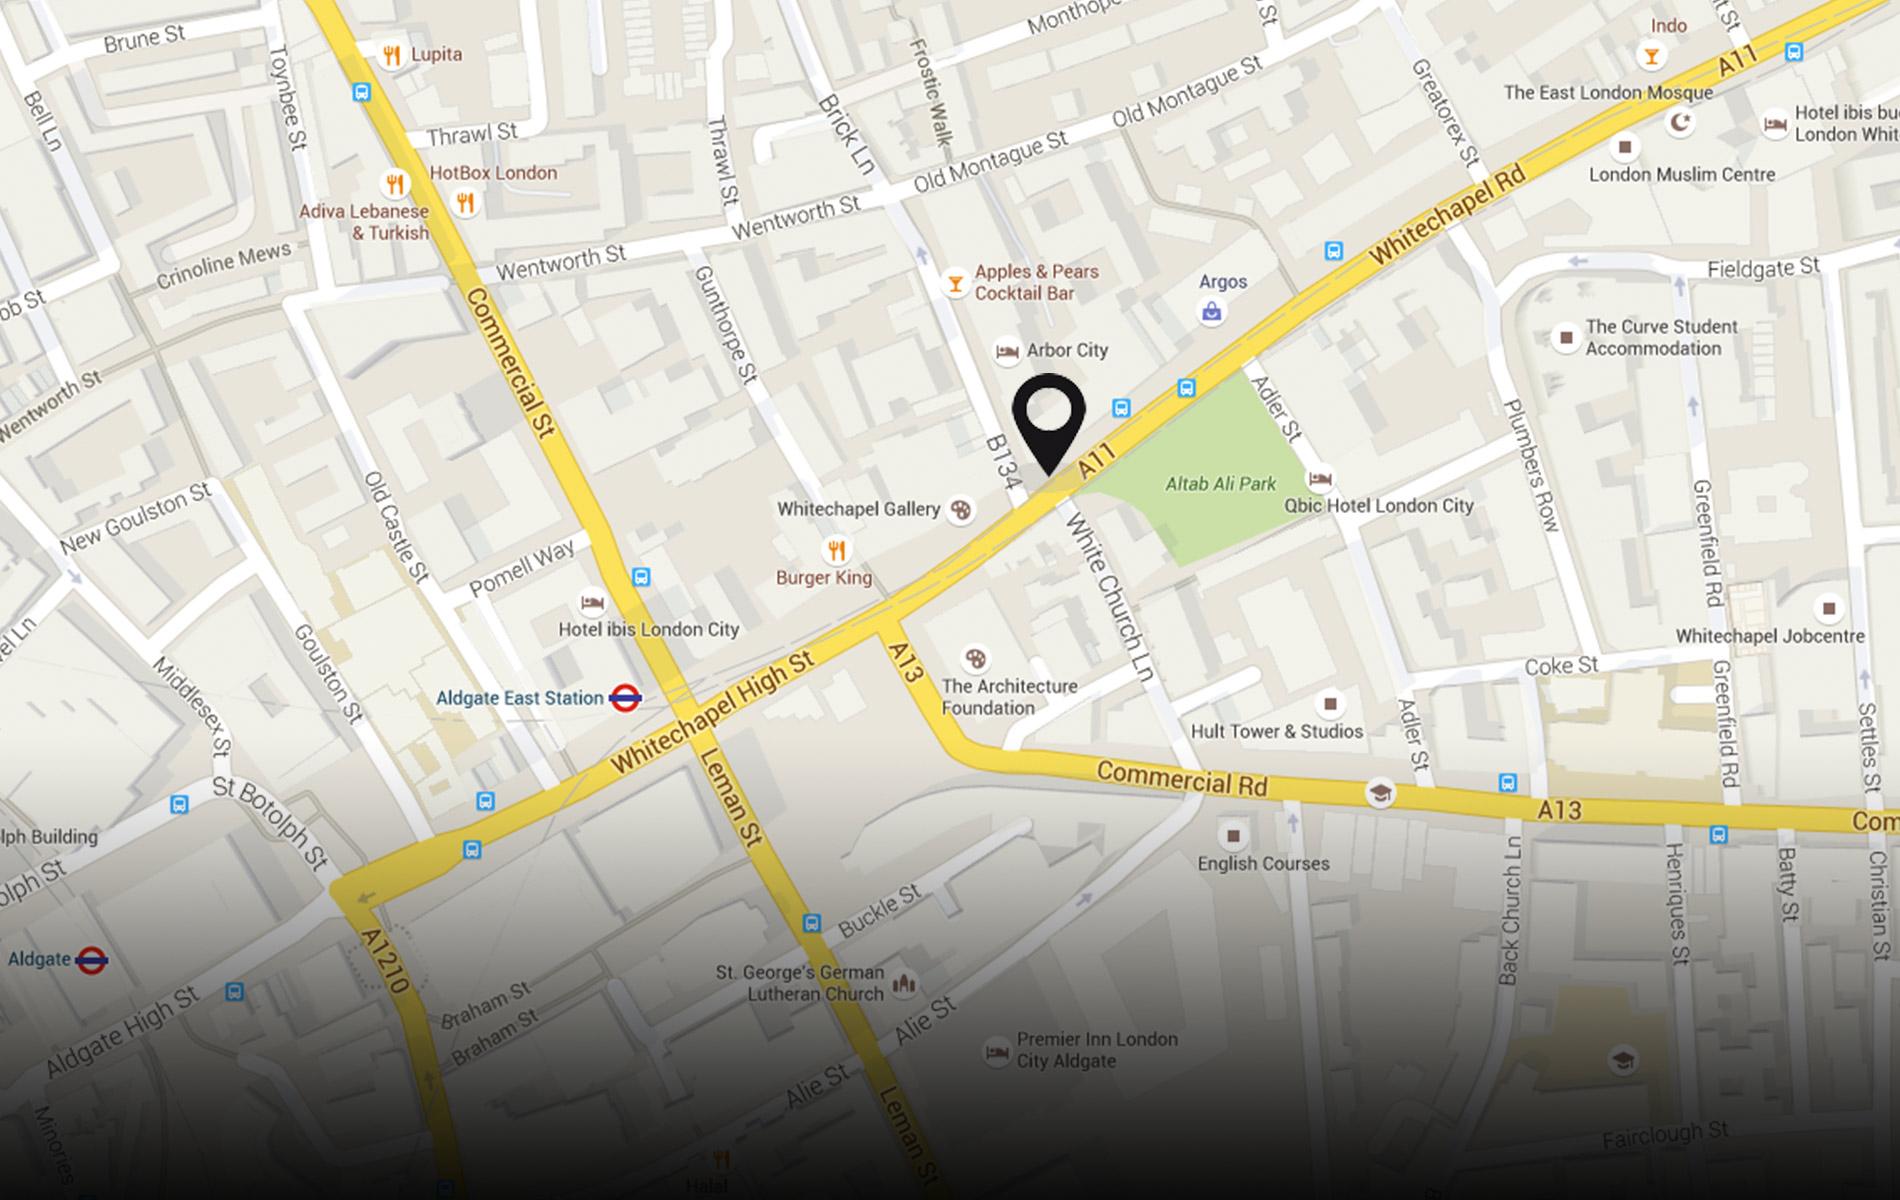 1 Whitechapel Rd, London E1 6TY